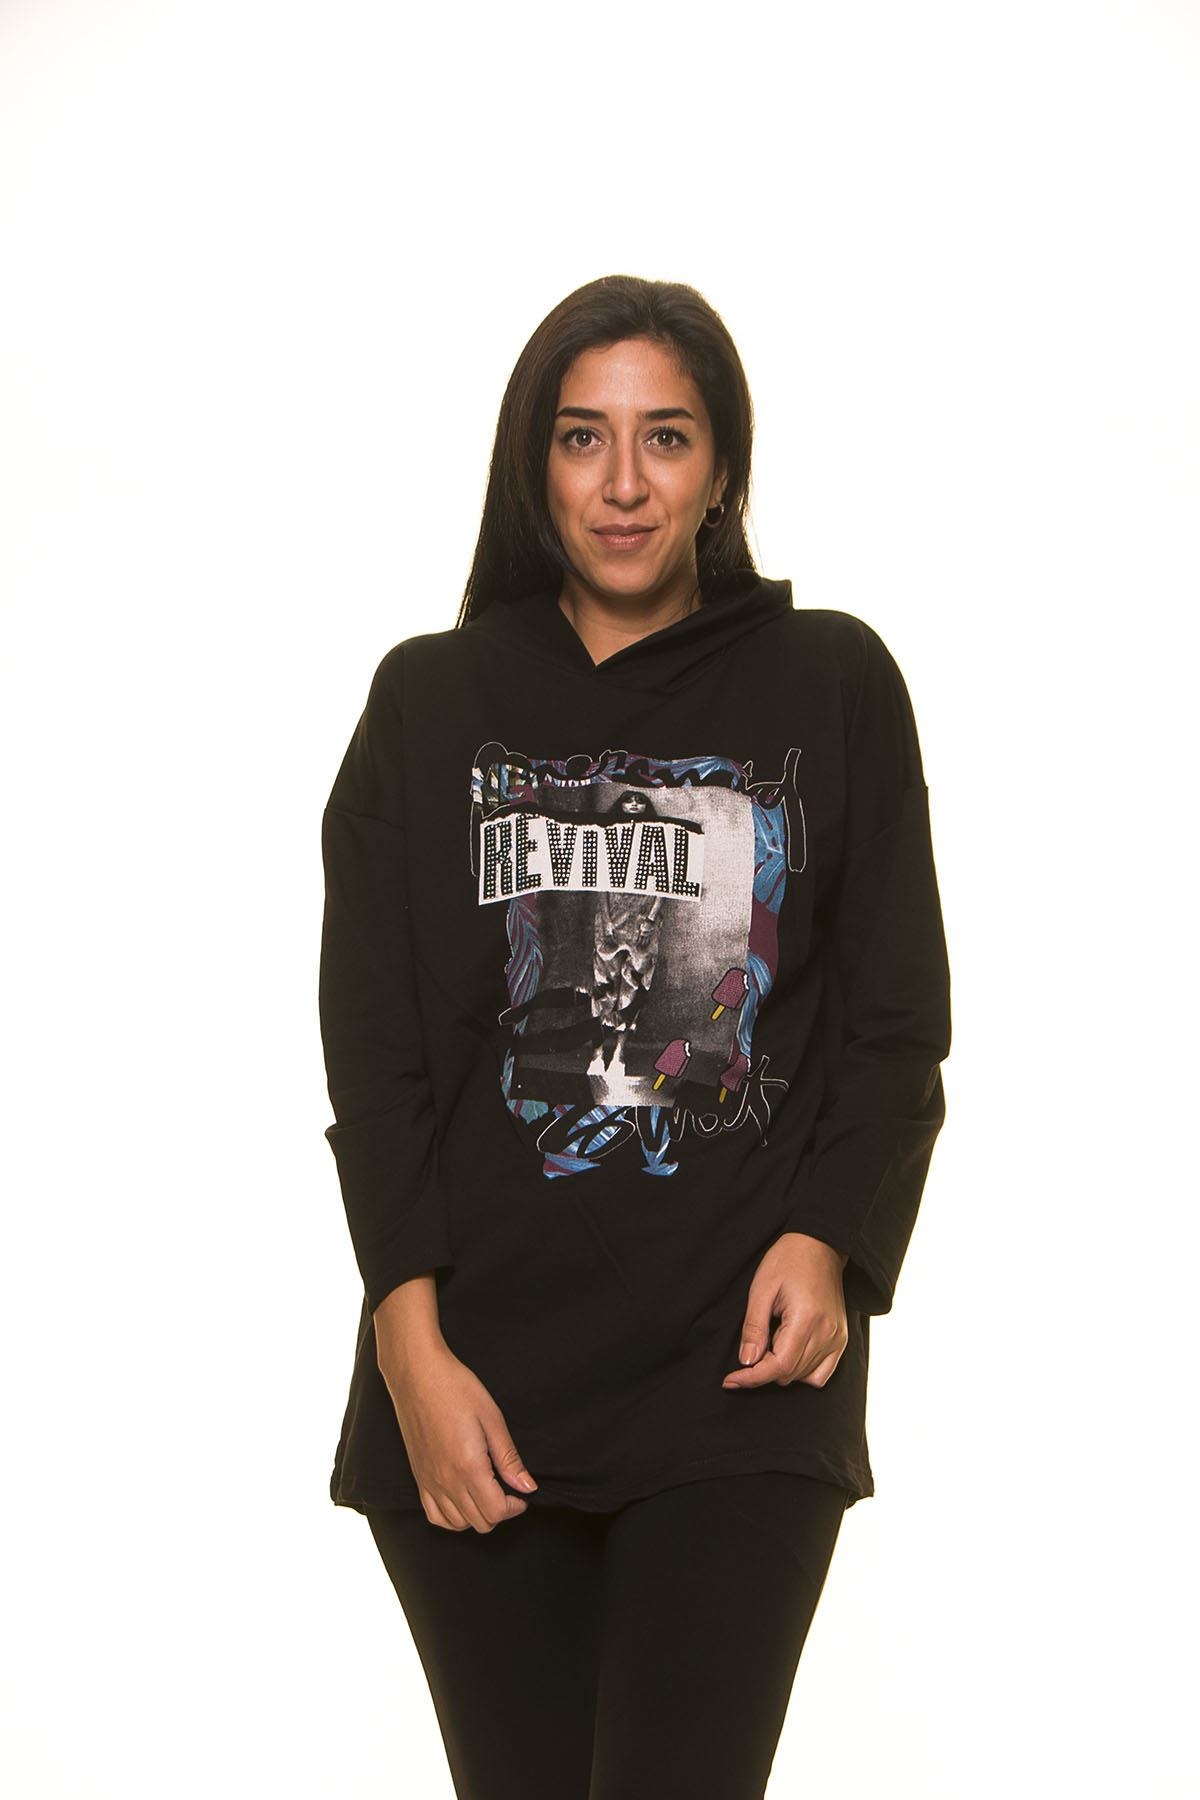 Siyah Kapşonlu Sweat 5F-1121